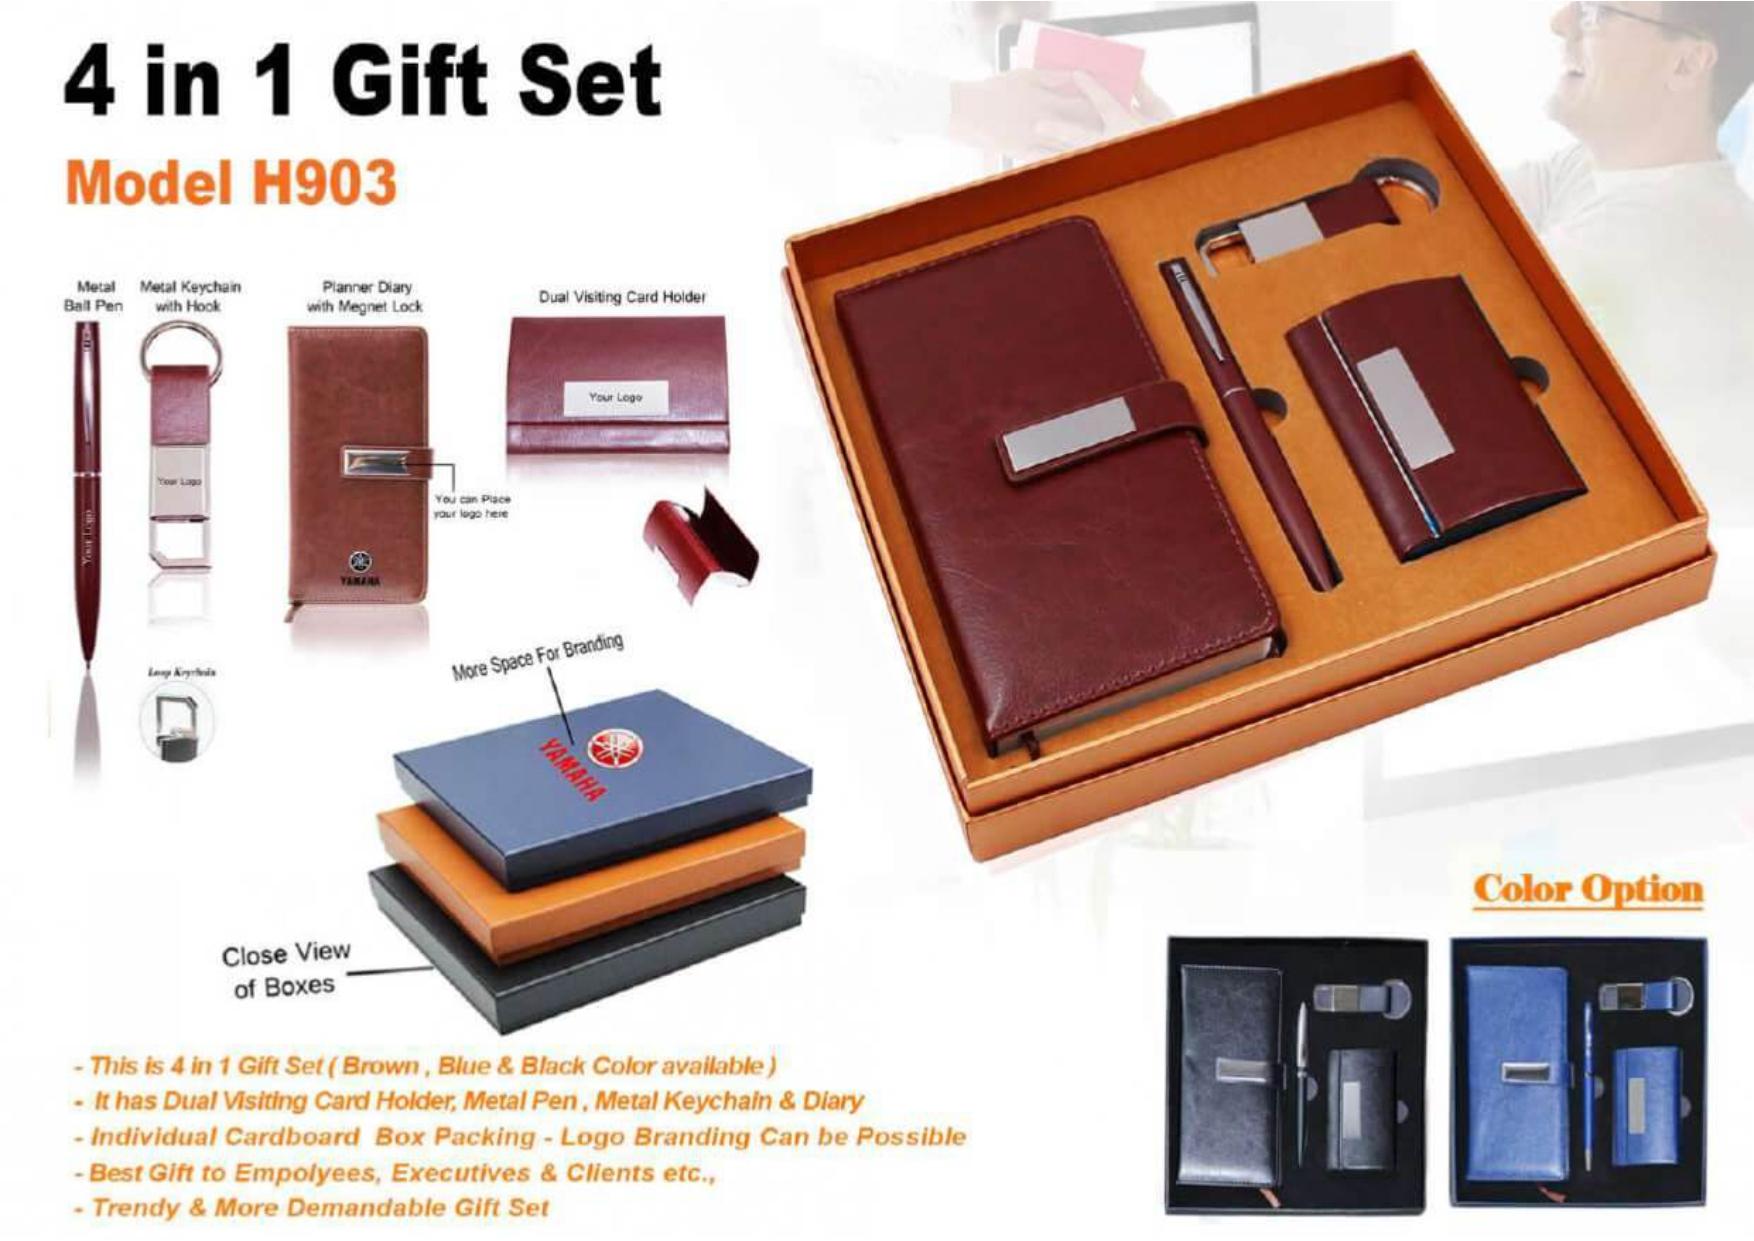 Planner Diary Pen Keychain Card Holder 903